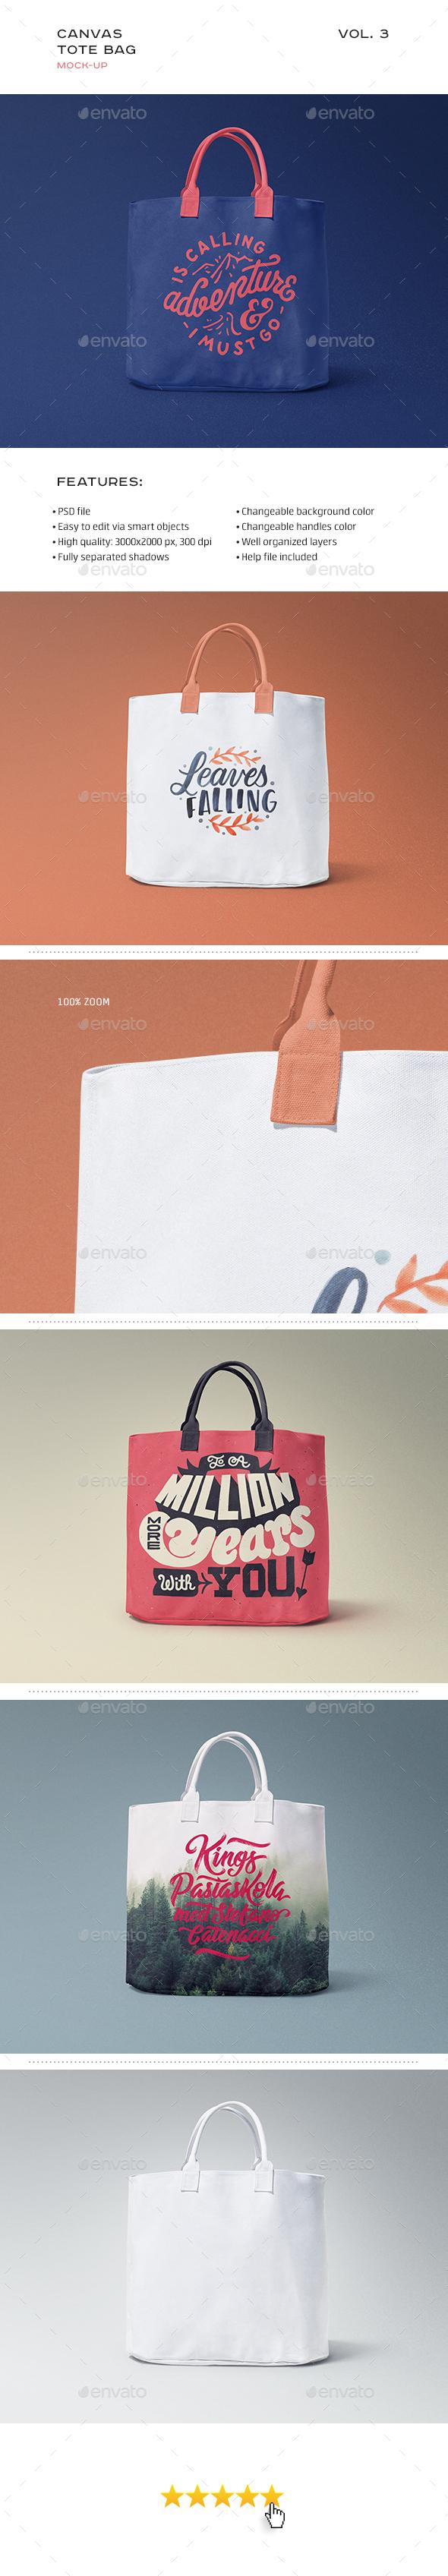 Canvas Tote Bag Mock-up Vol. 3 - Miscellaneous Product Mock-Ups